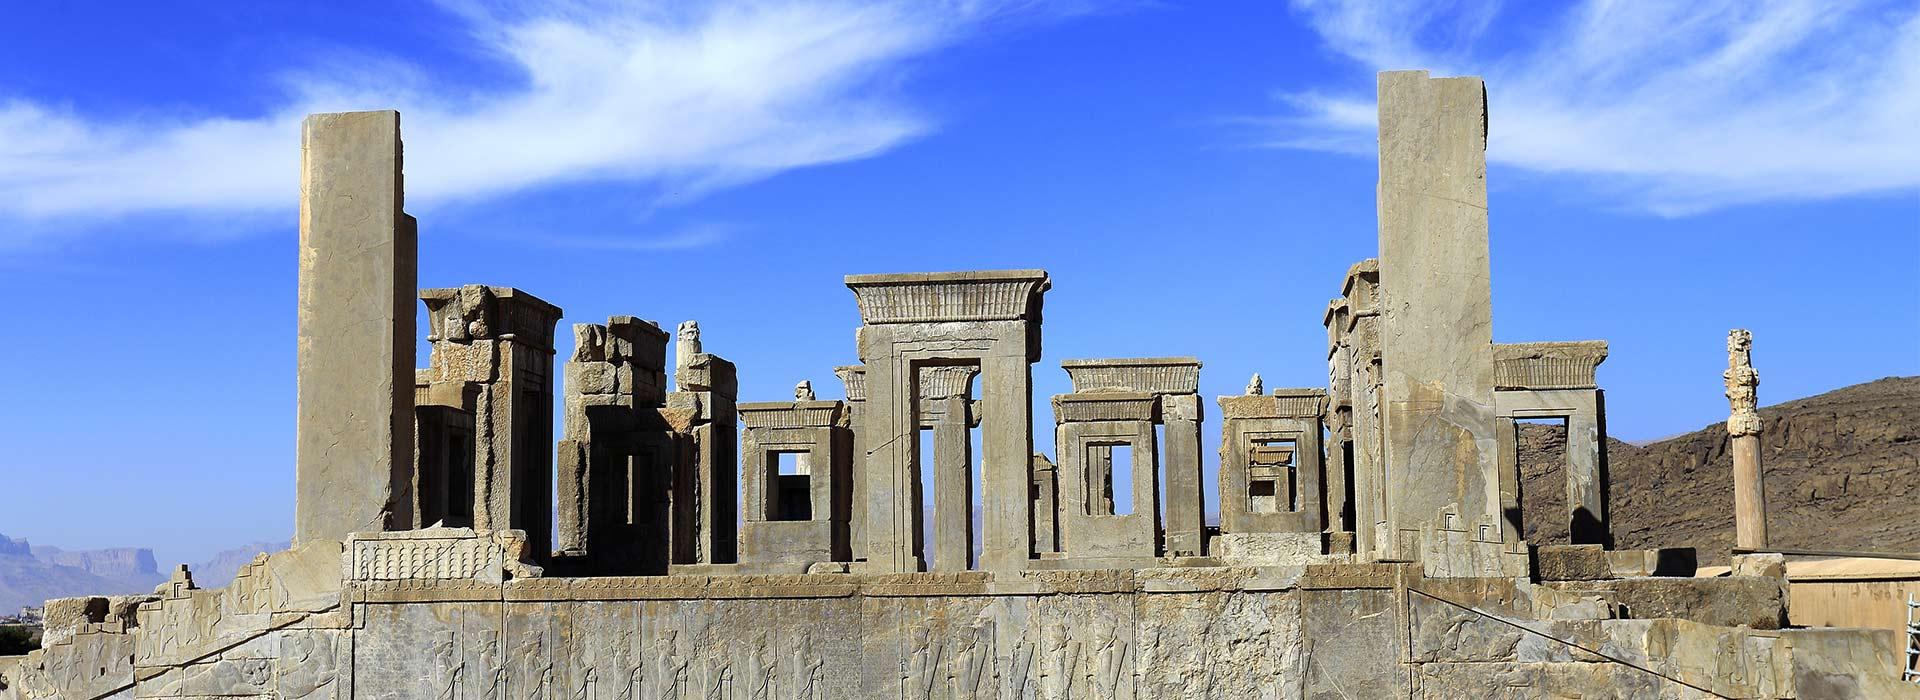 Persepolis Iran Tour